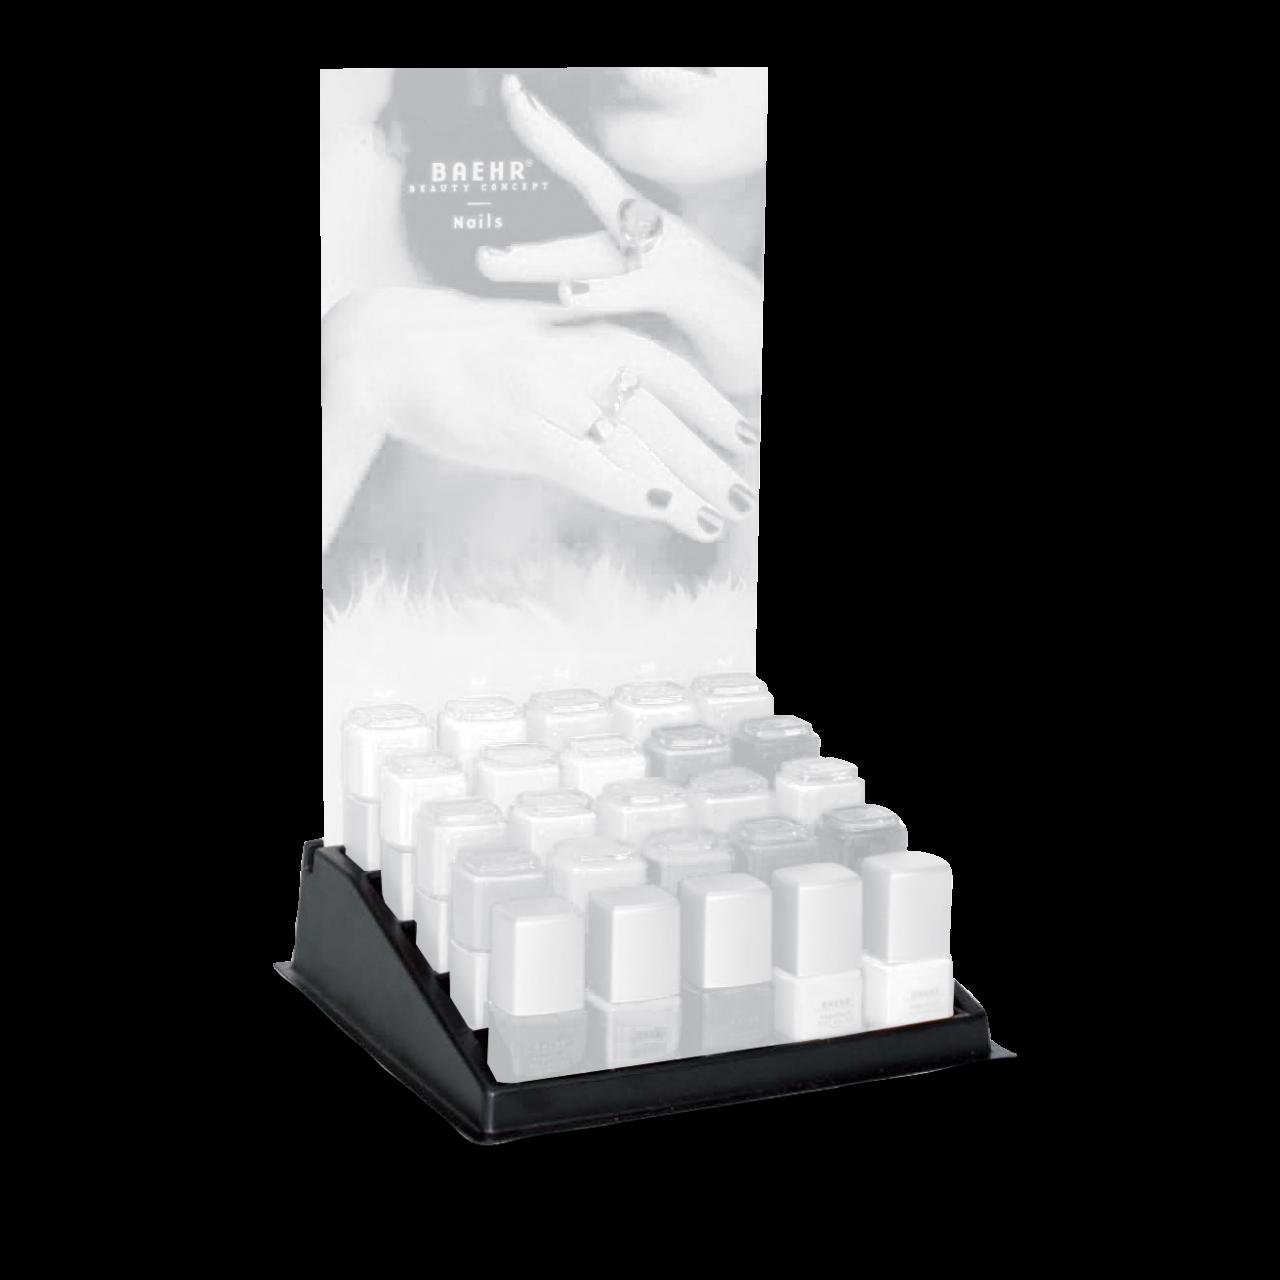 Nagellack-Display leer, schwarz